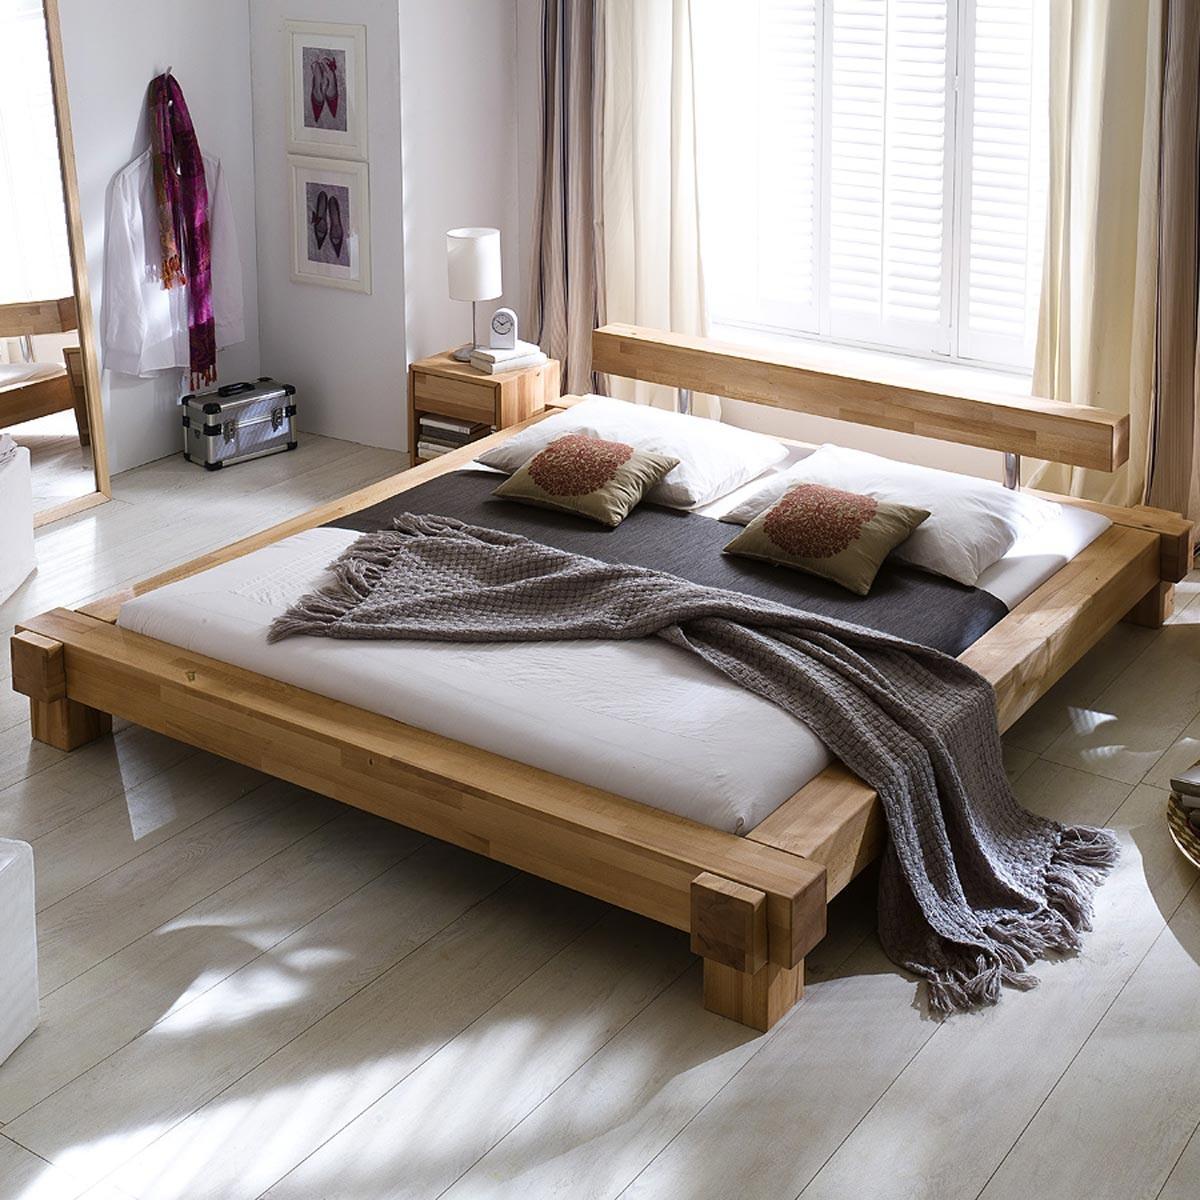 bett parana 140 x 200 cm in kernbuche massiv ge lt. Black Bedroom Furniture Sets. Home Design Ideas